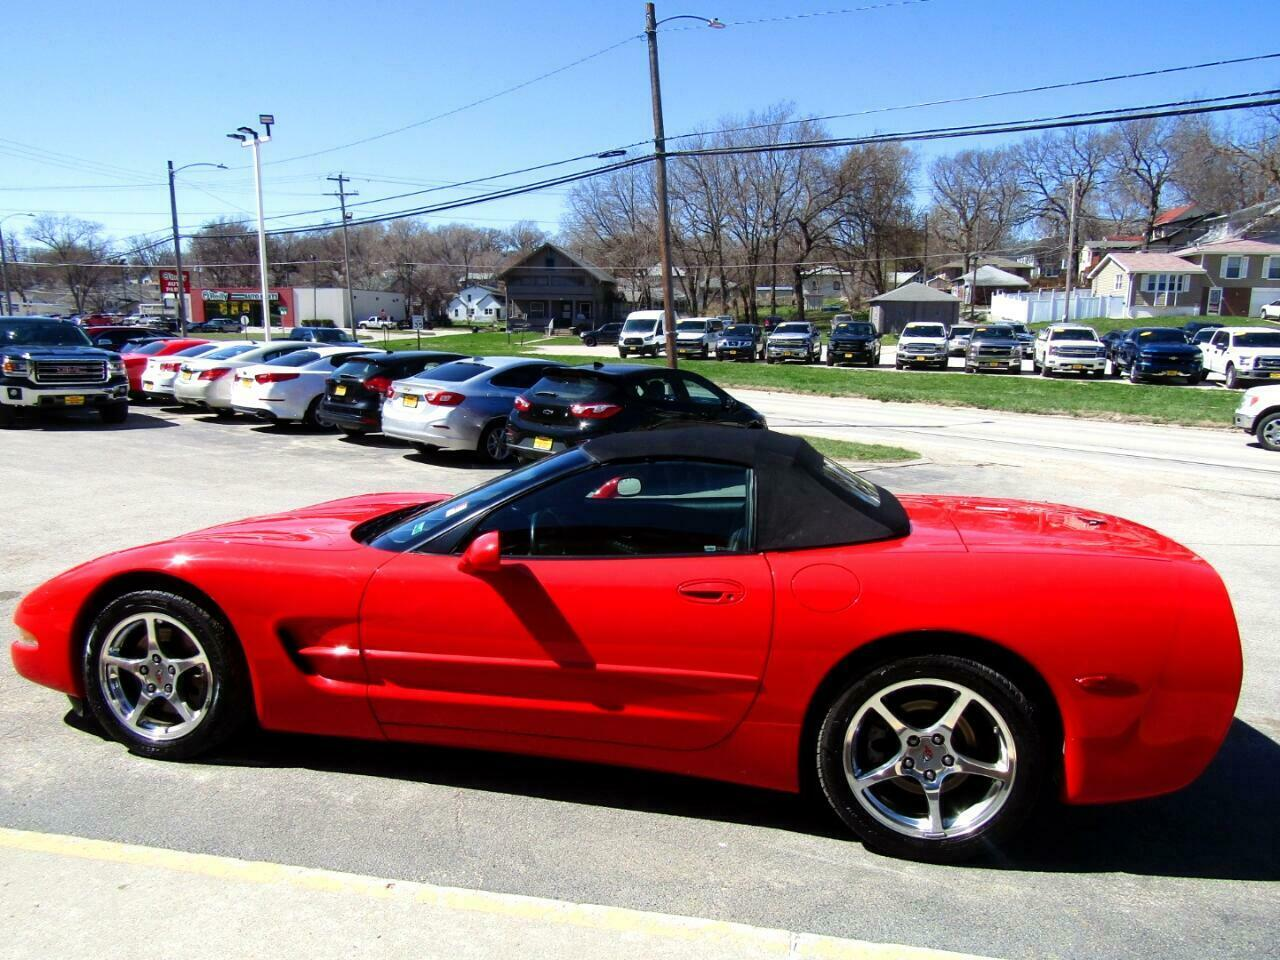 2004 Red Chevrolet Corvette Convertible  | C5 Corvette Photo 7